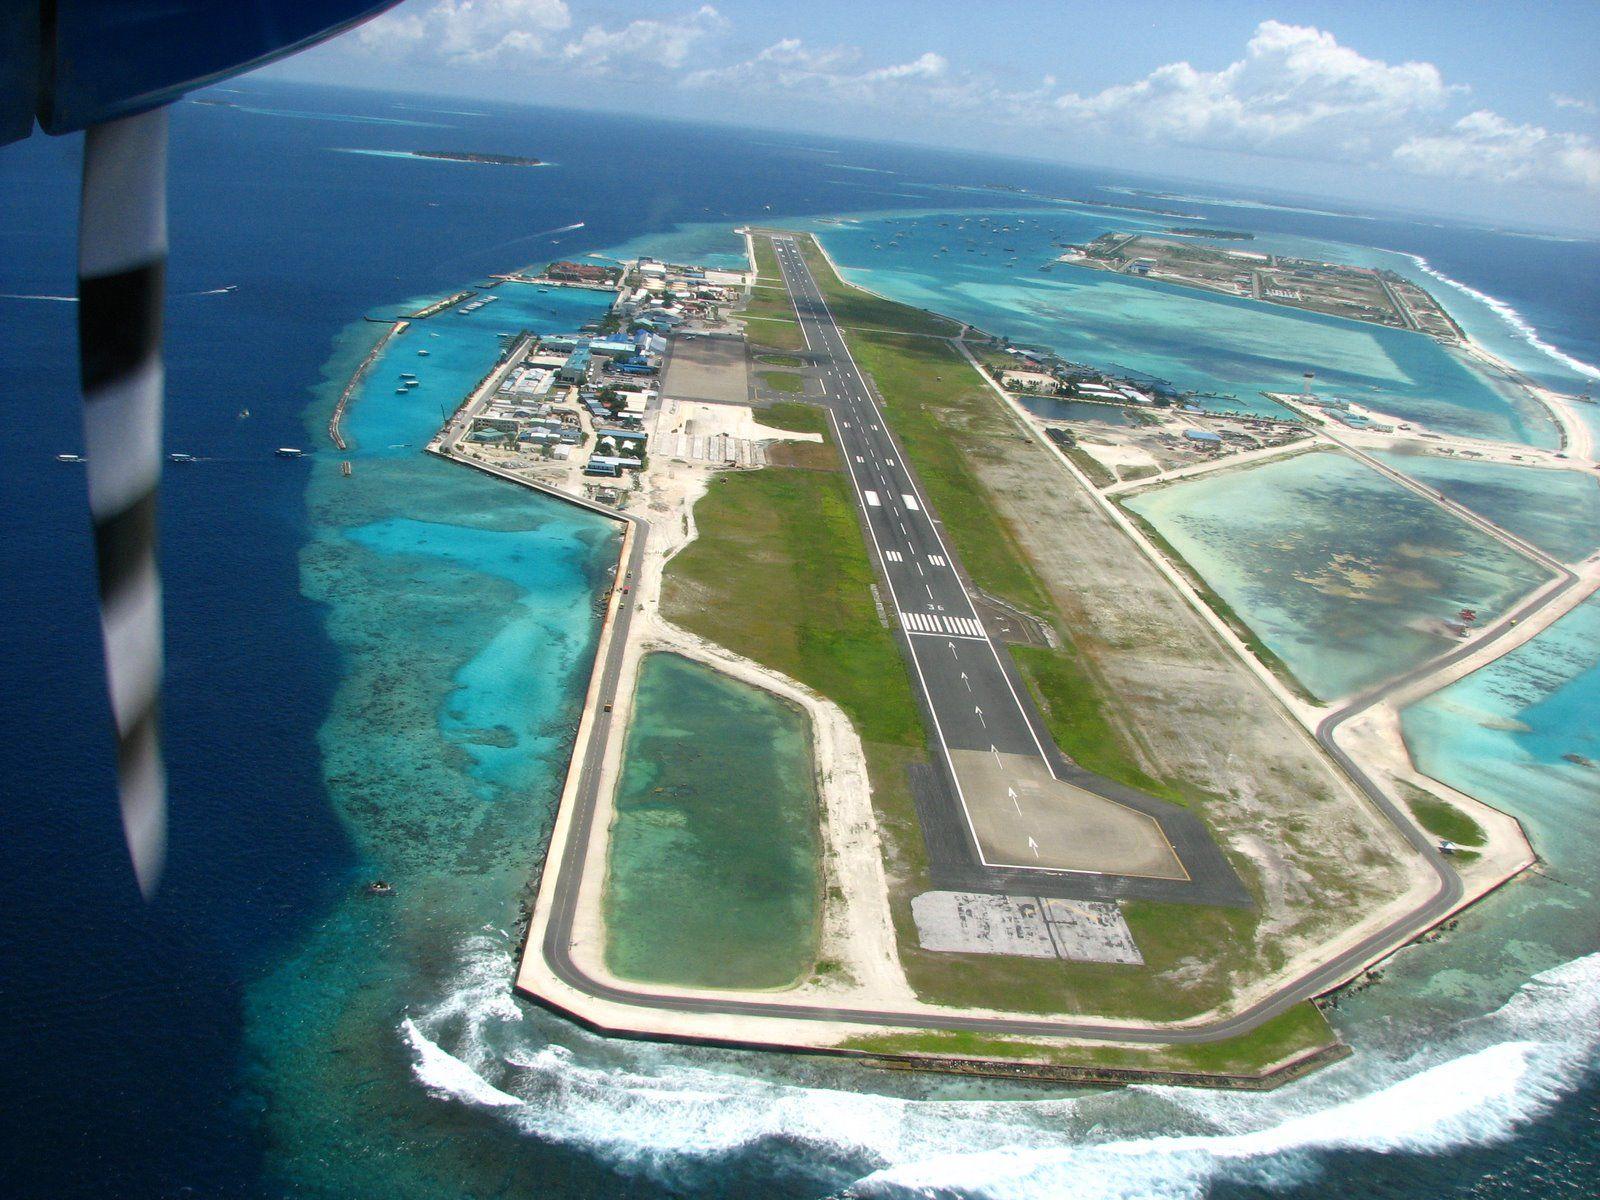 Aeroporto Male Maldive : Malé international airport male international airport is on an